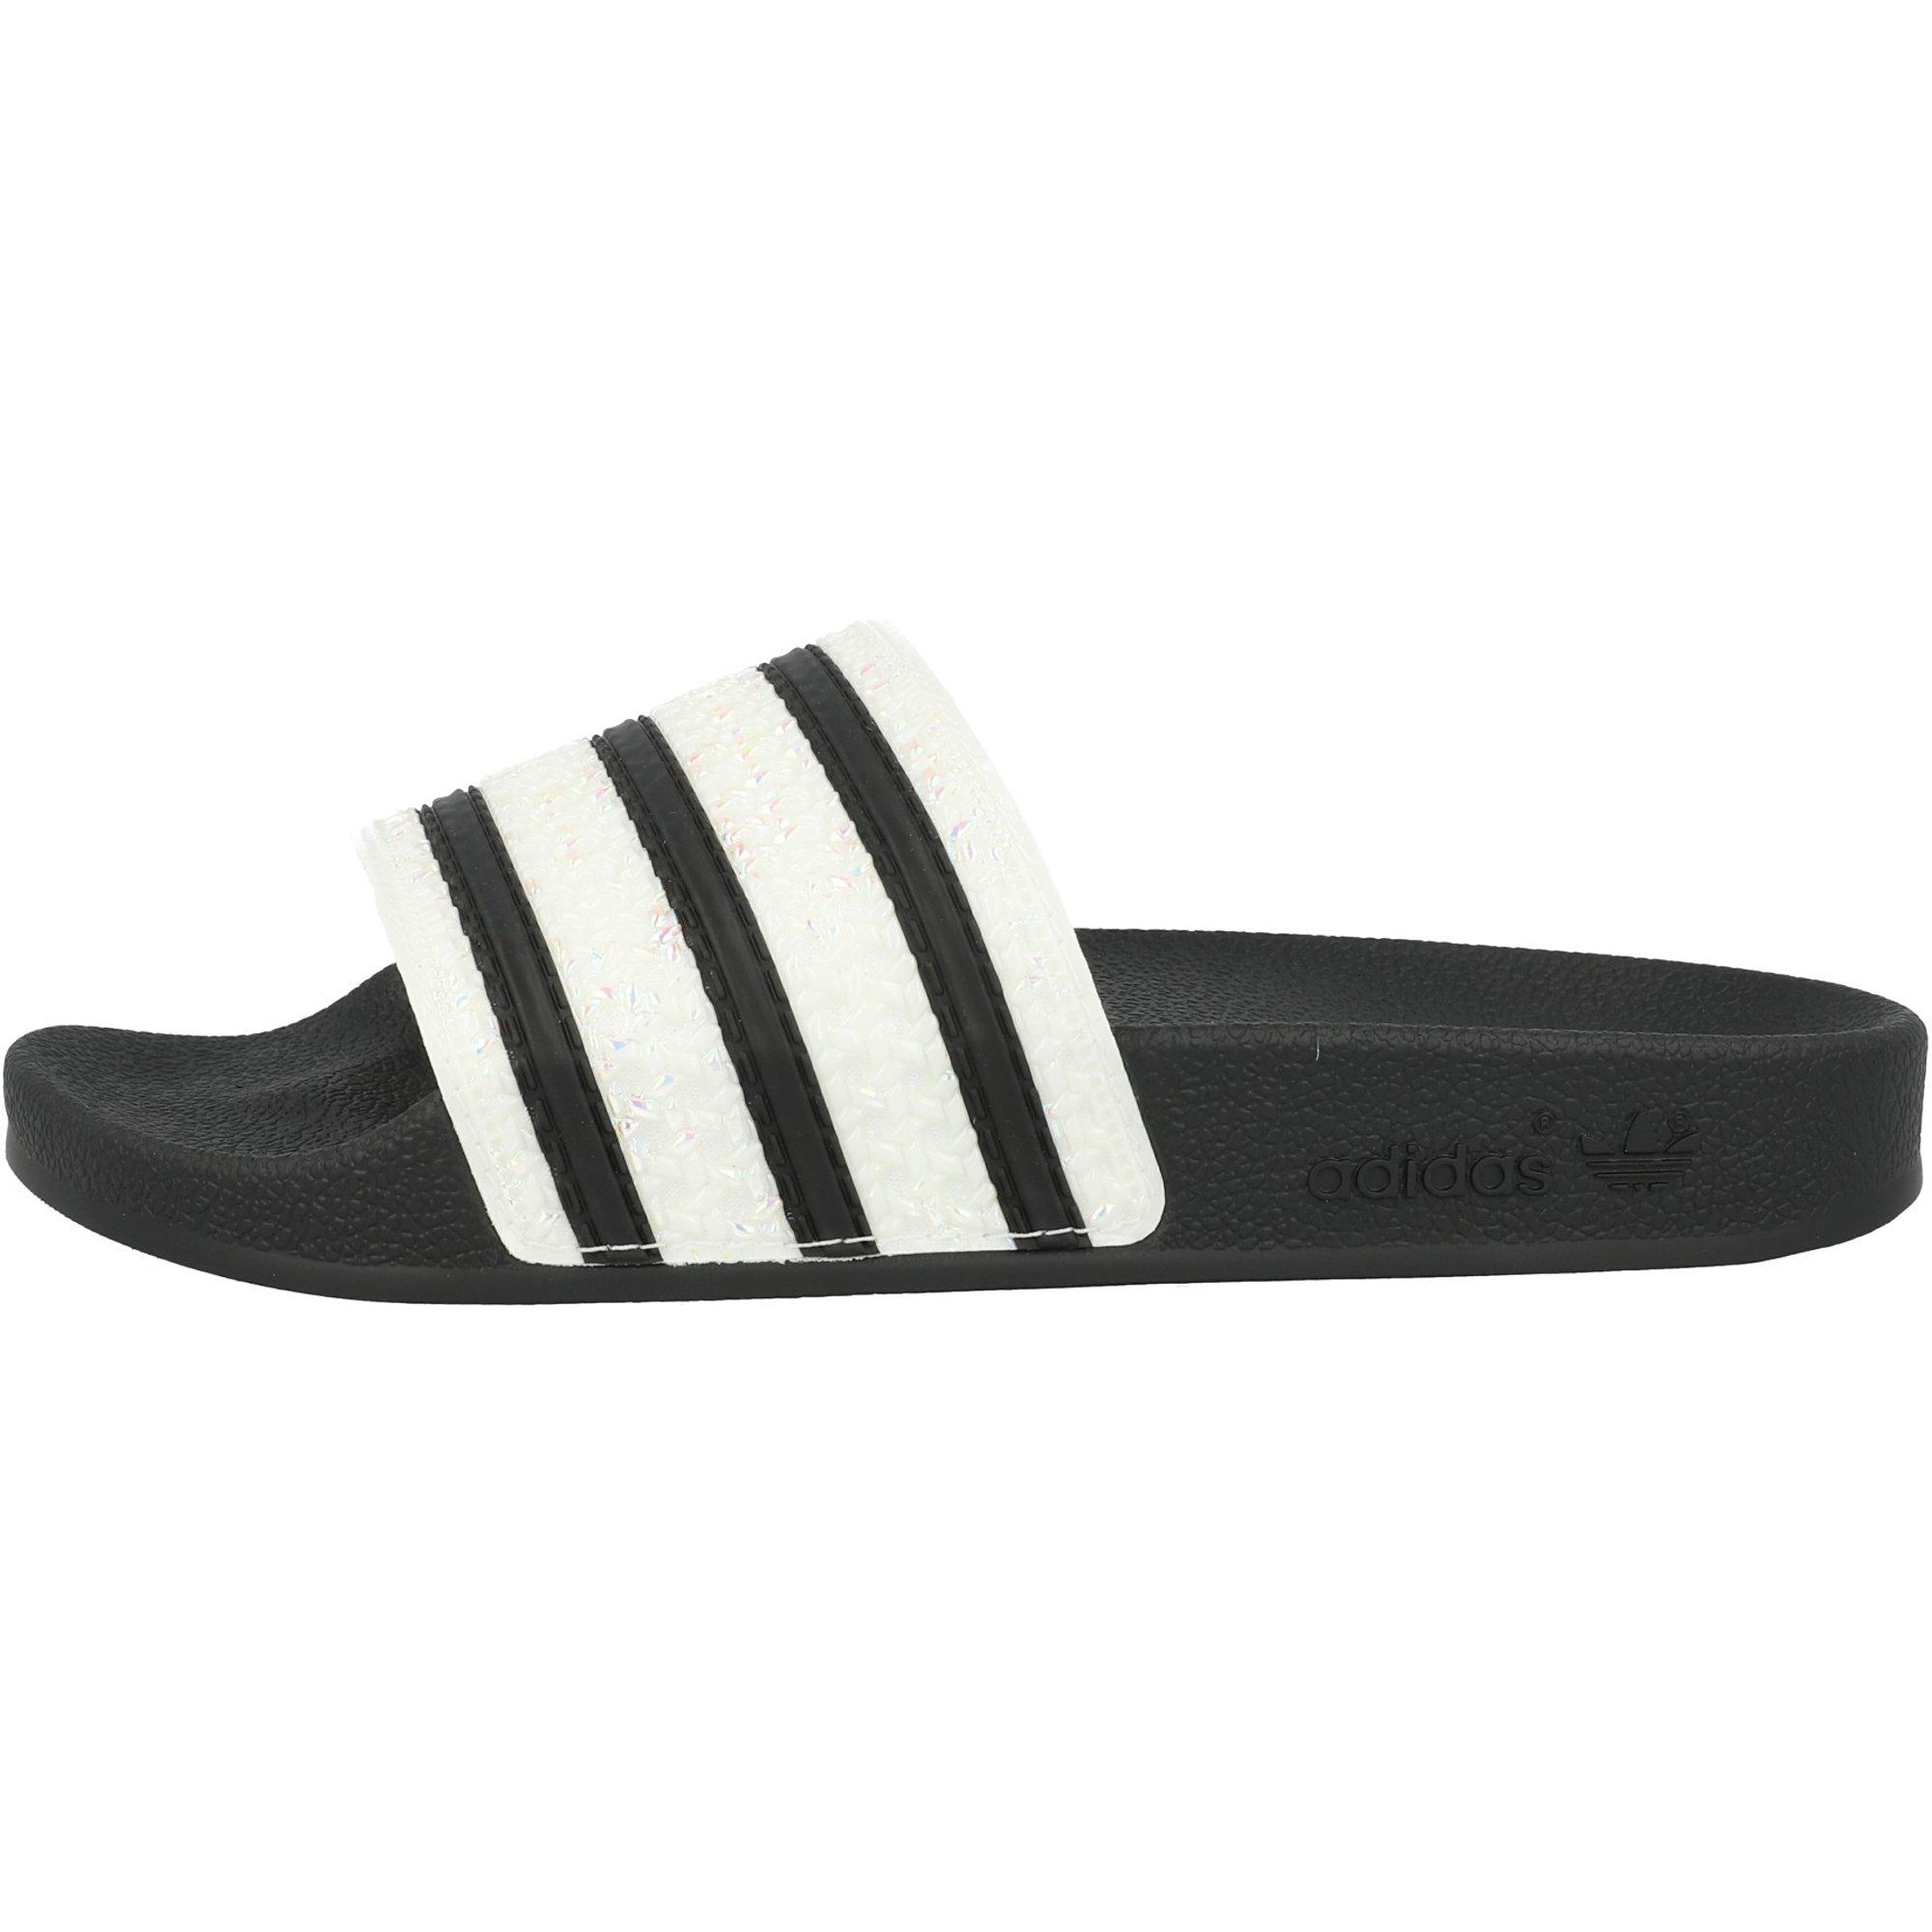 adidas Originals adilette W Black Synthetic Adult